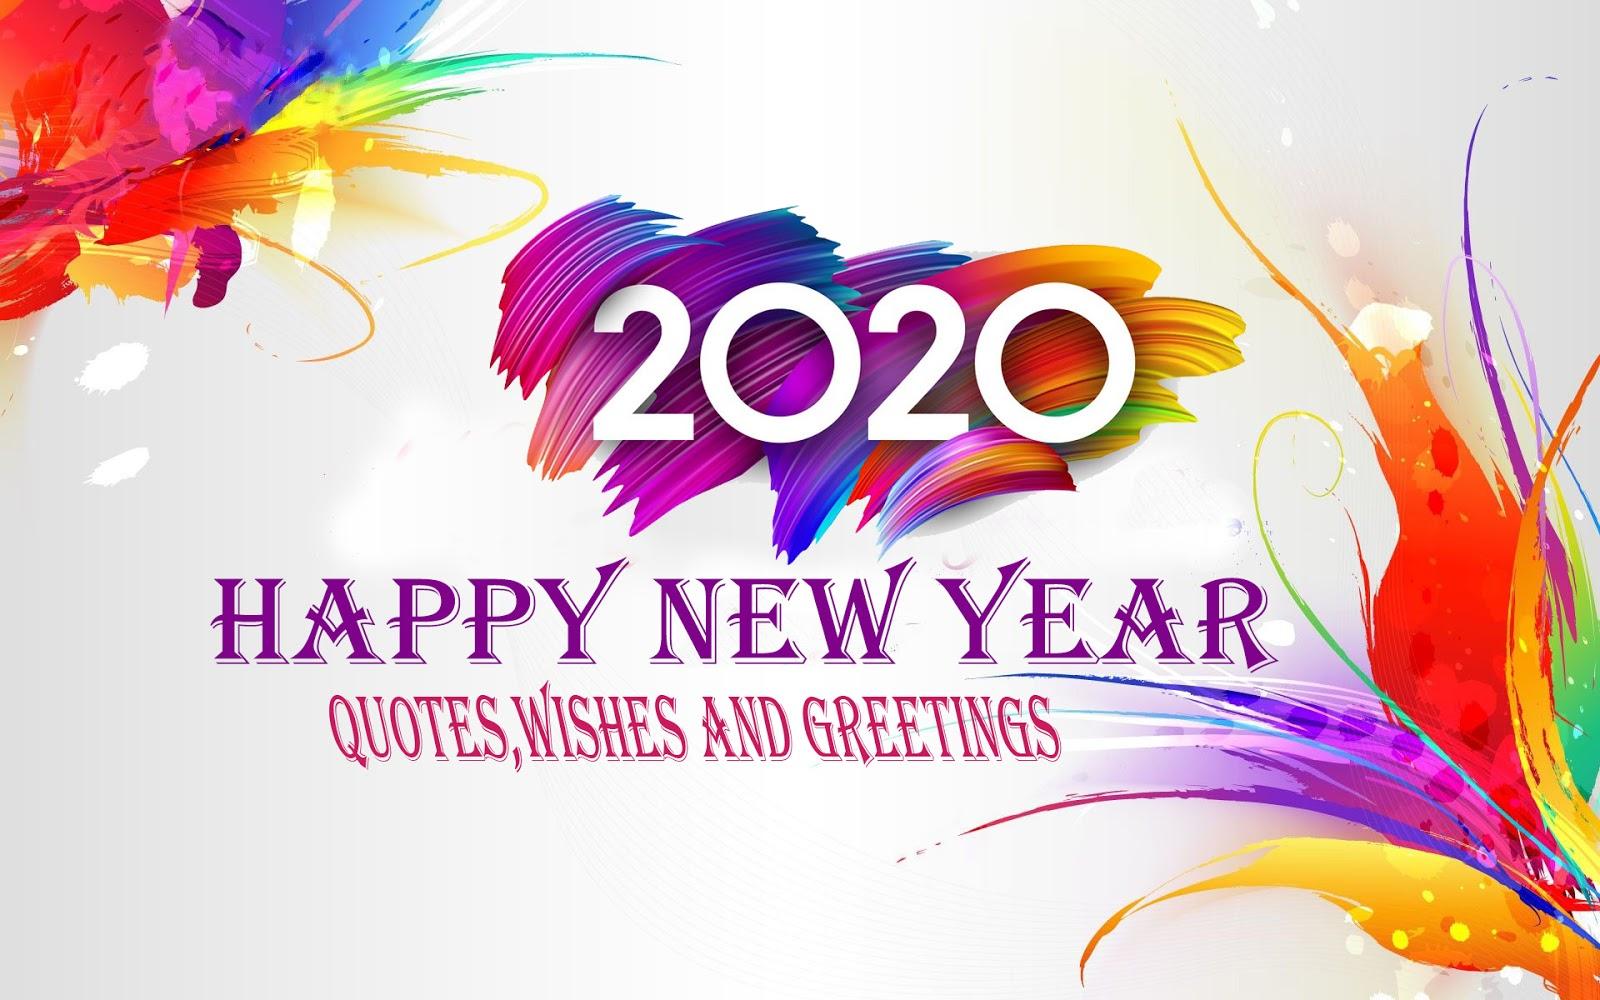 100 Kata Kata Ucapan Selamat Tahun Baru 2020 Gambar Quotes